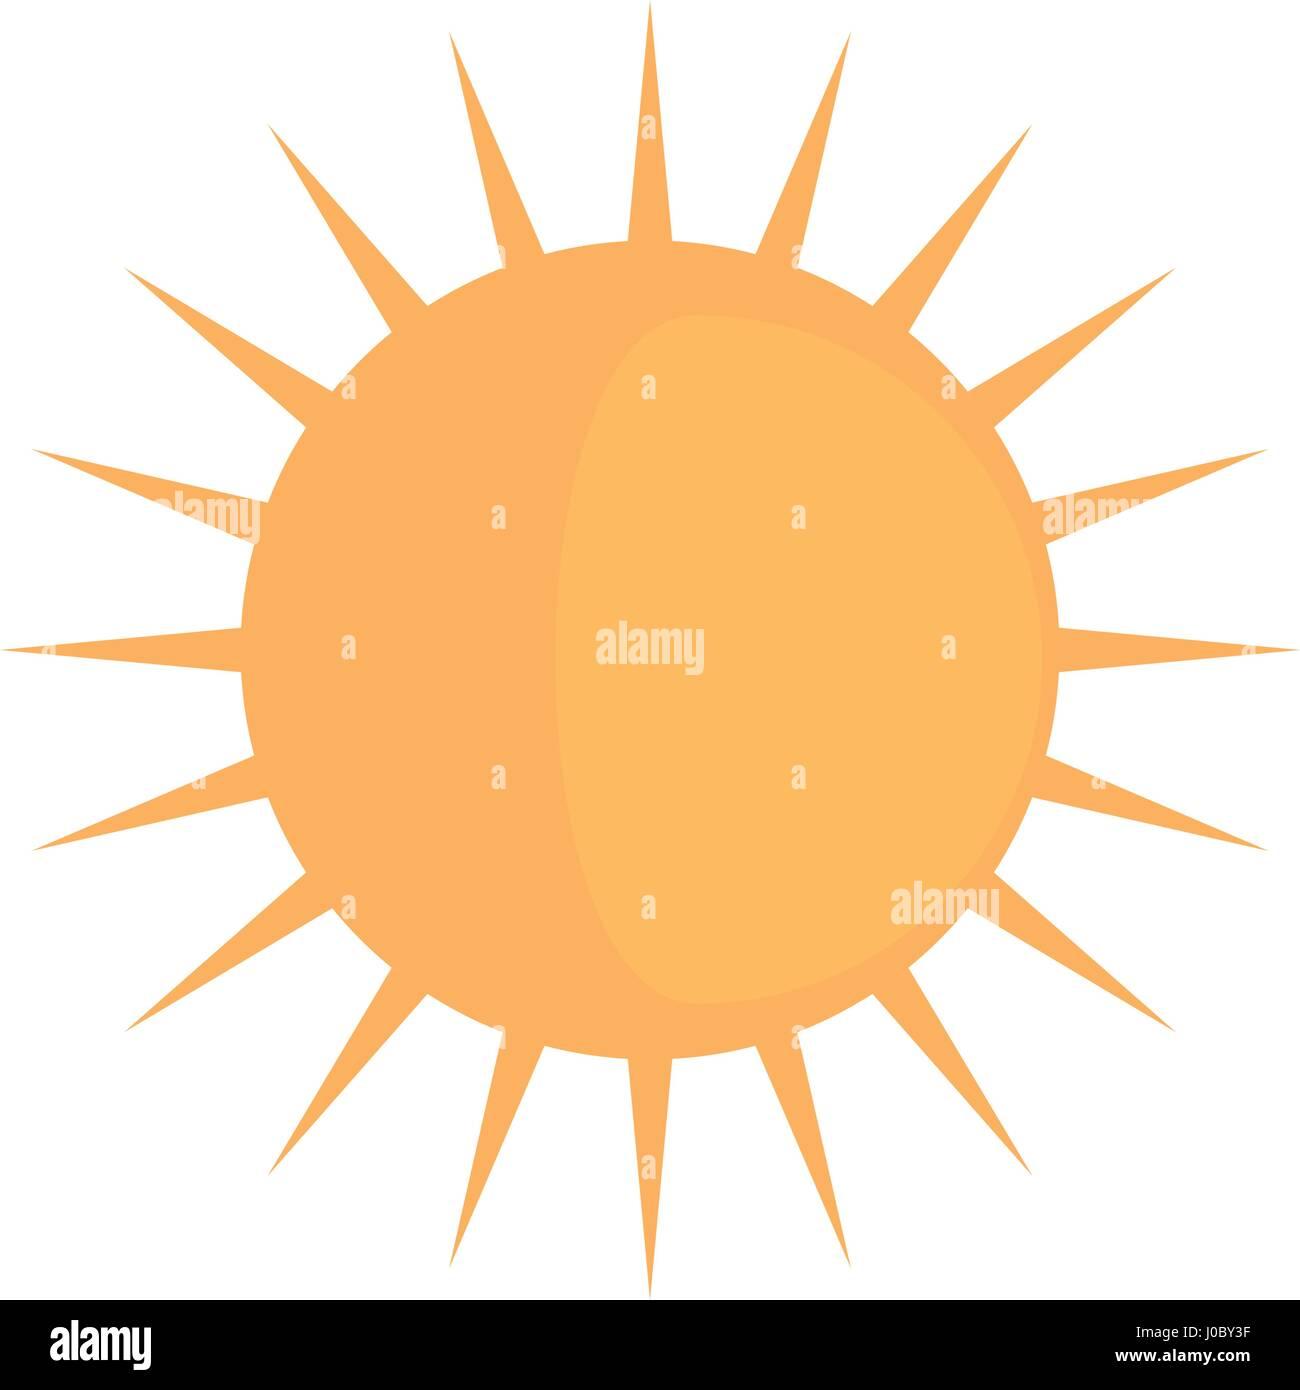 sun day funny sunny image - Stock Vector